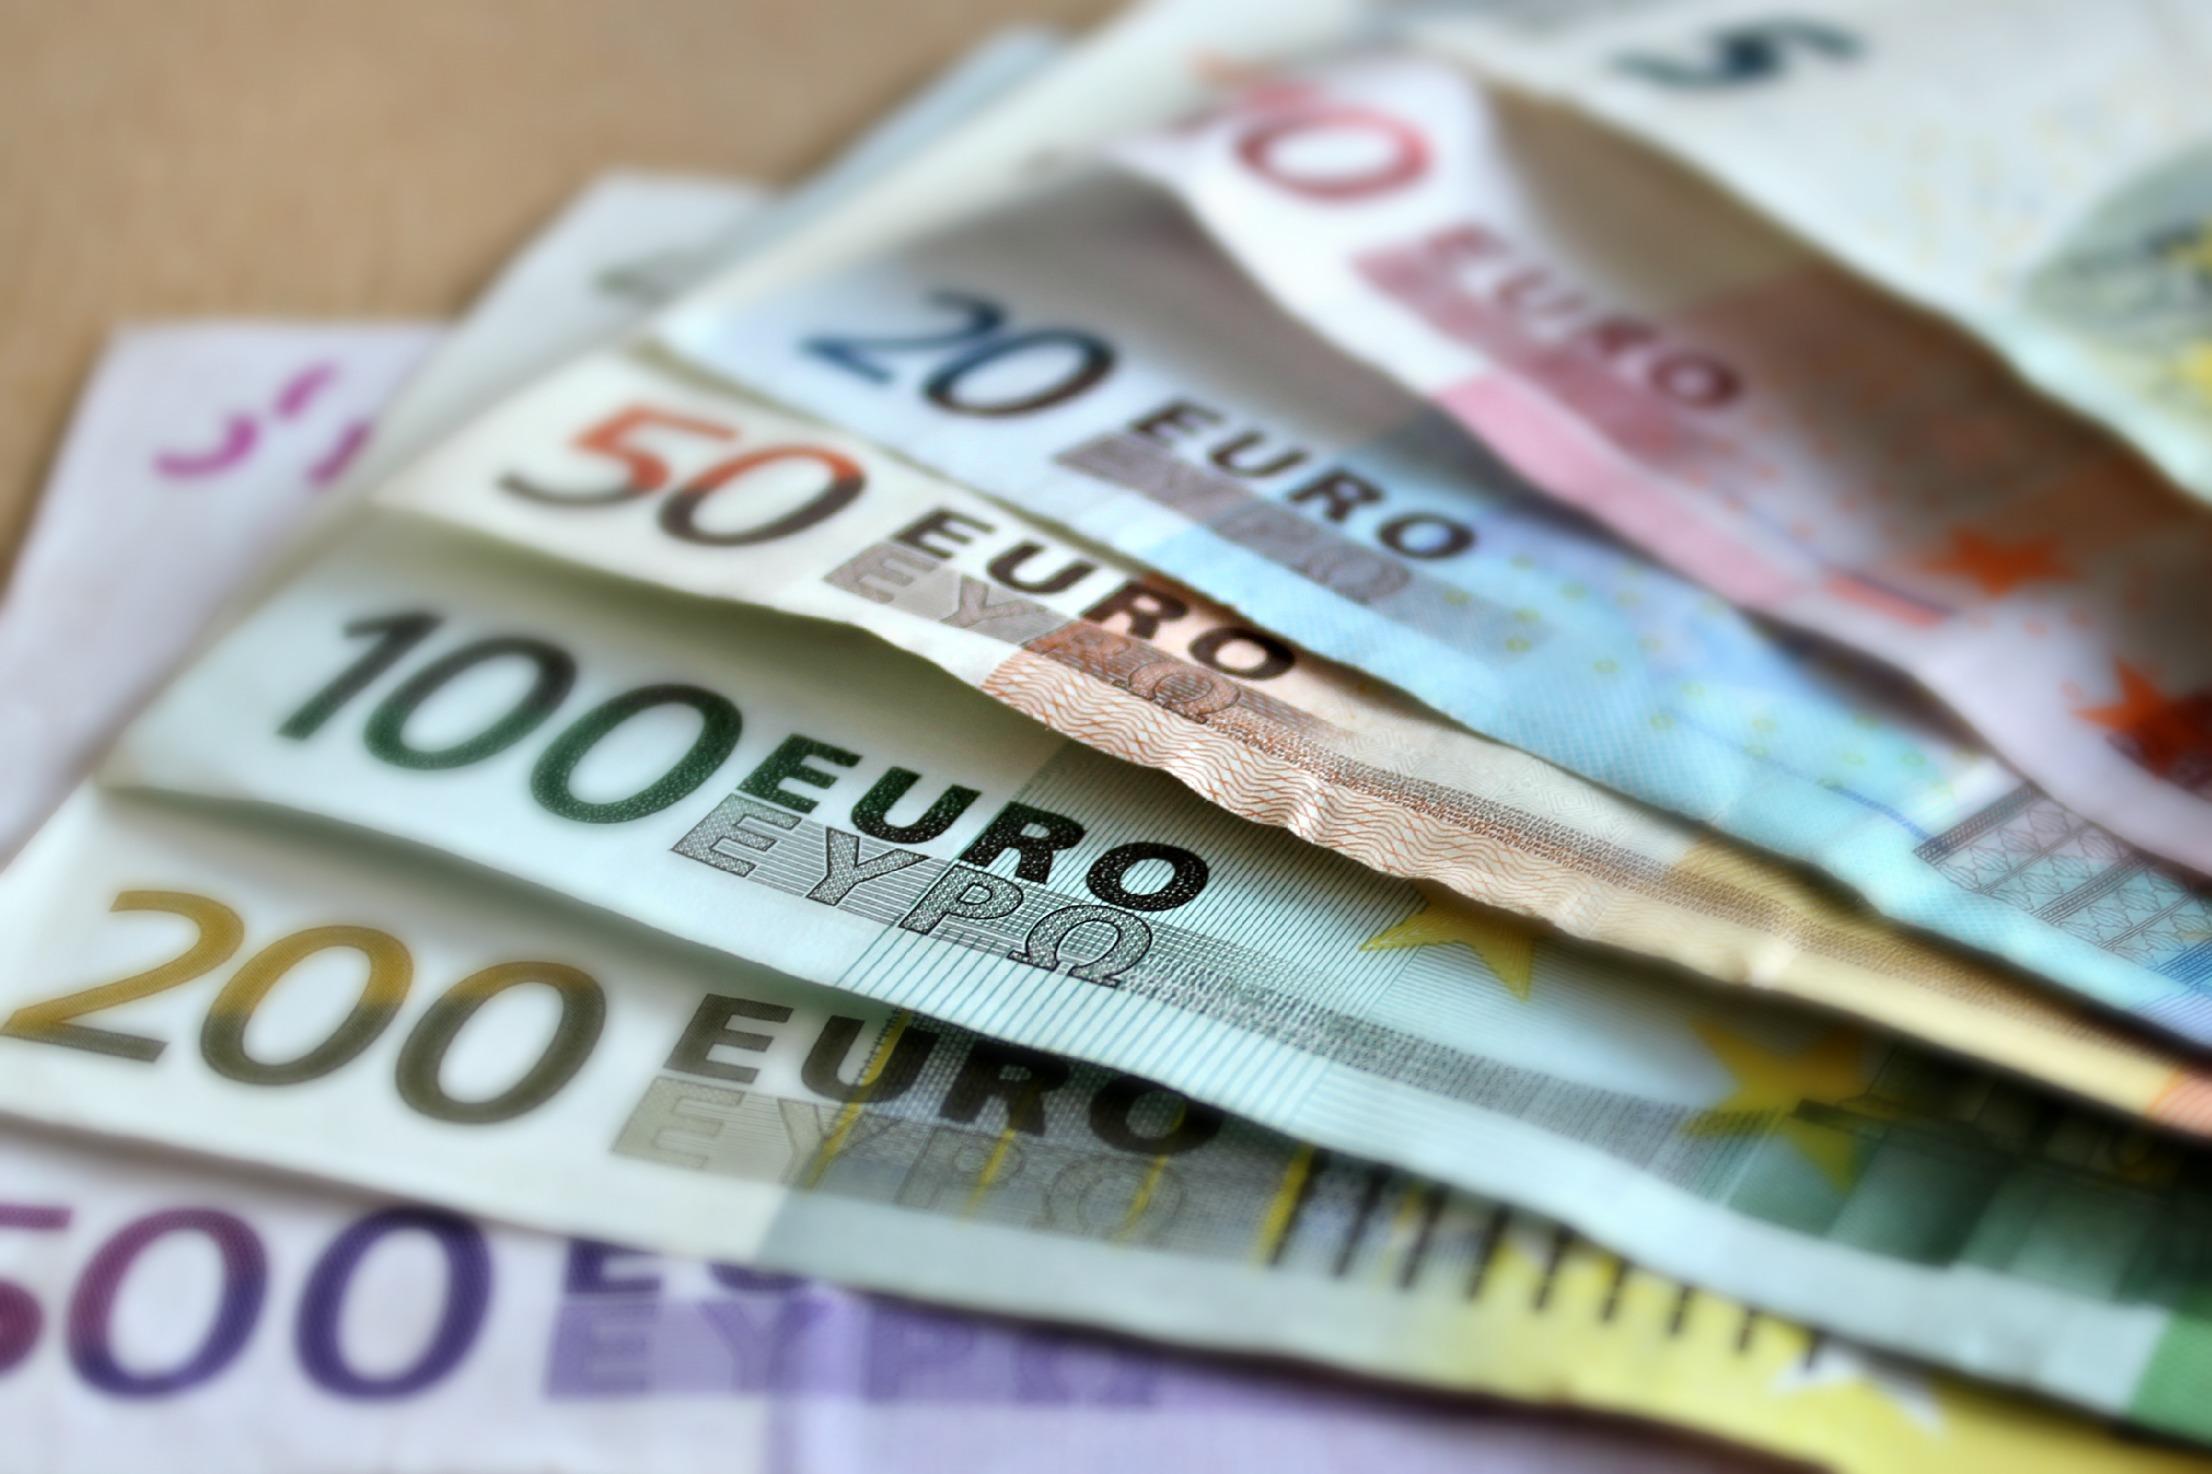 bank-note-euro-bills-paper-money-63635